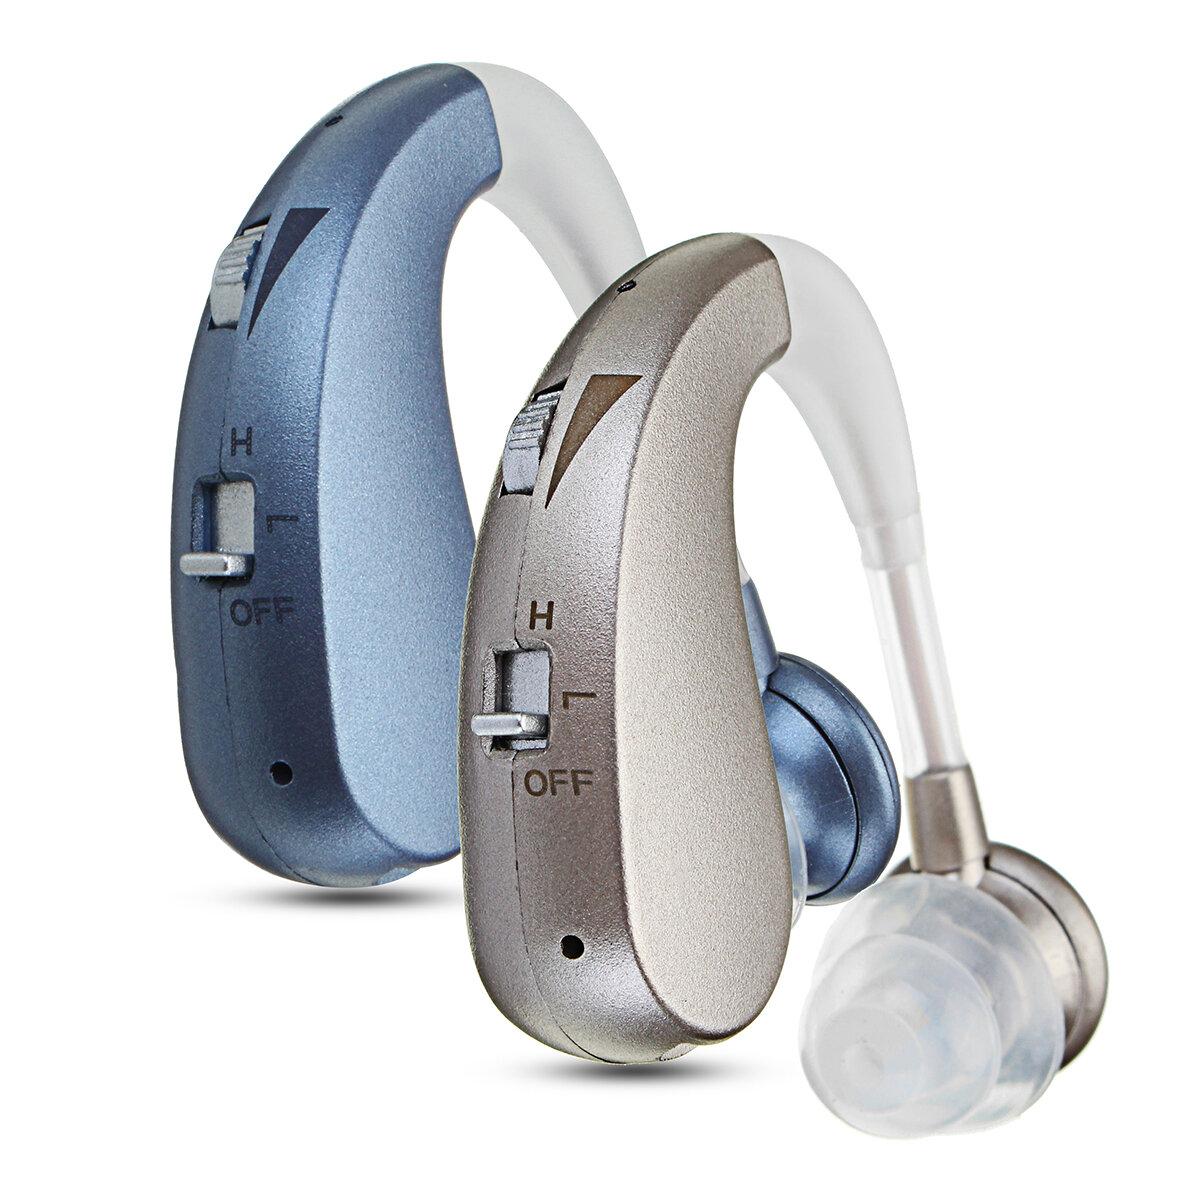 Recargable Audición Aids Audición Amplificador Cancelación adaptativa de reducción de ruido Cancelación de retroalimentación